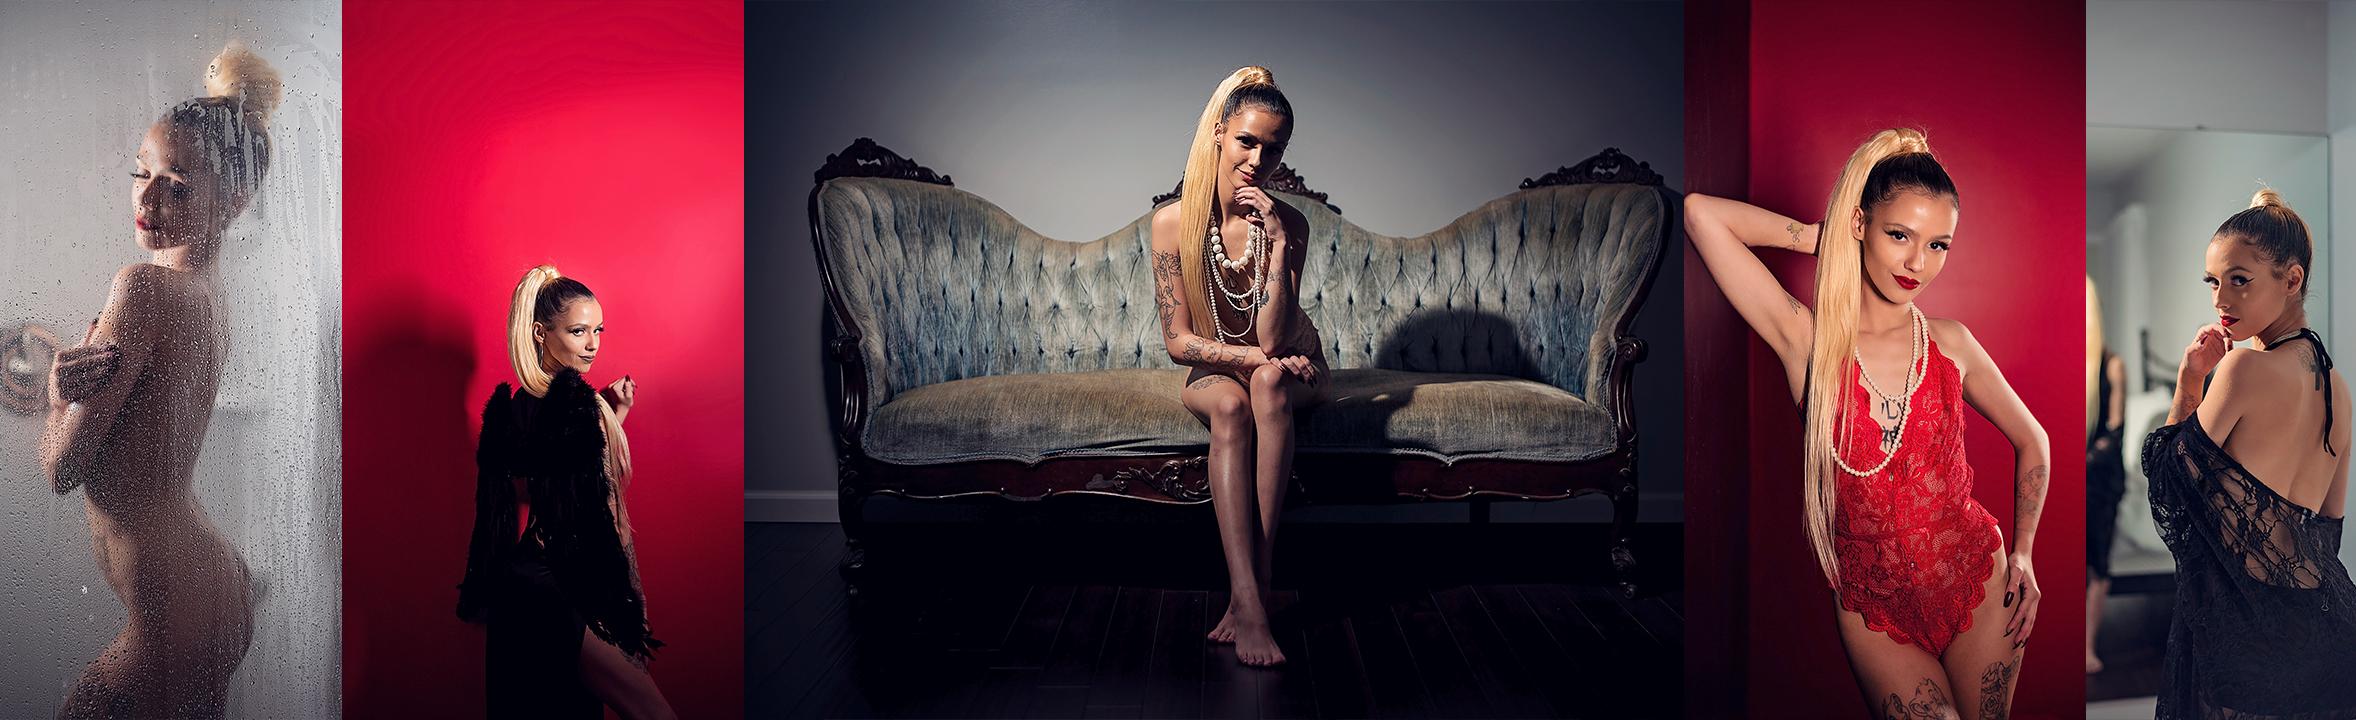 Dramatic Boudoir | Ashley's Night Session